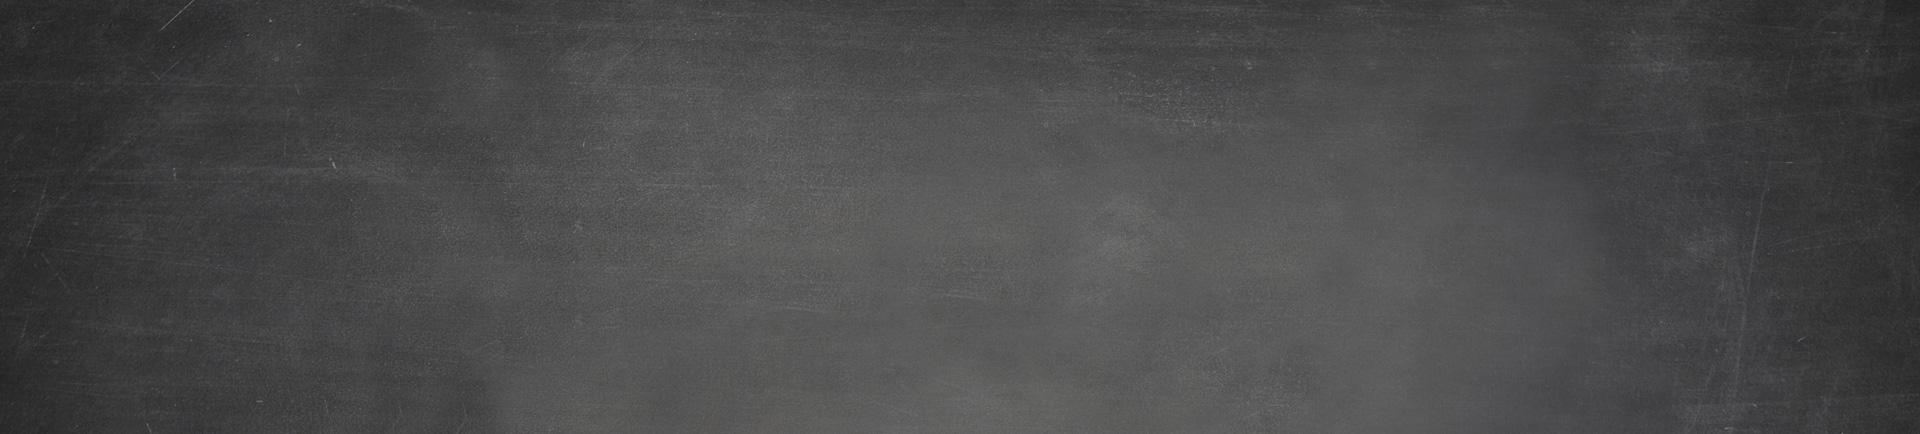 chalkboard bg